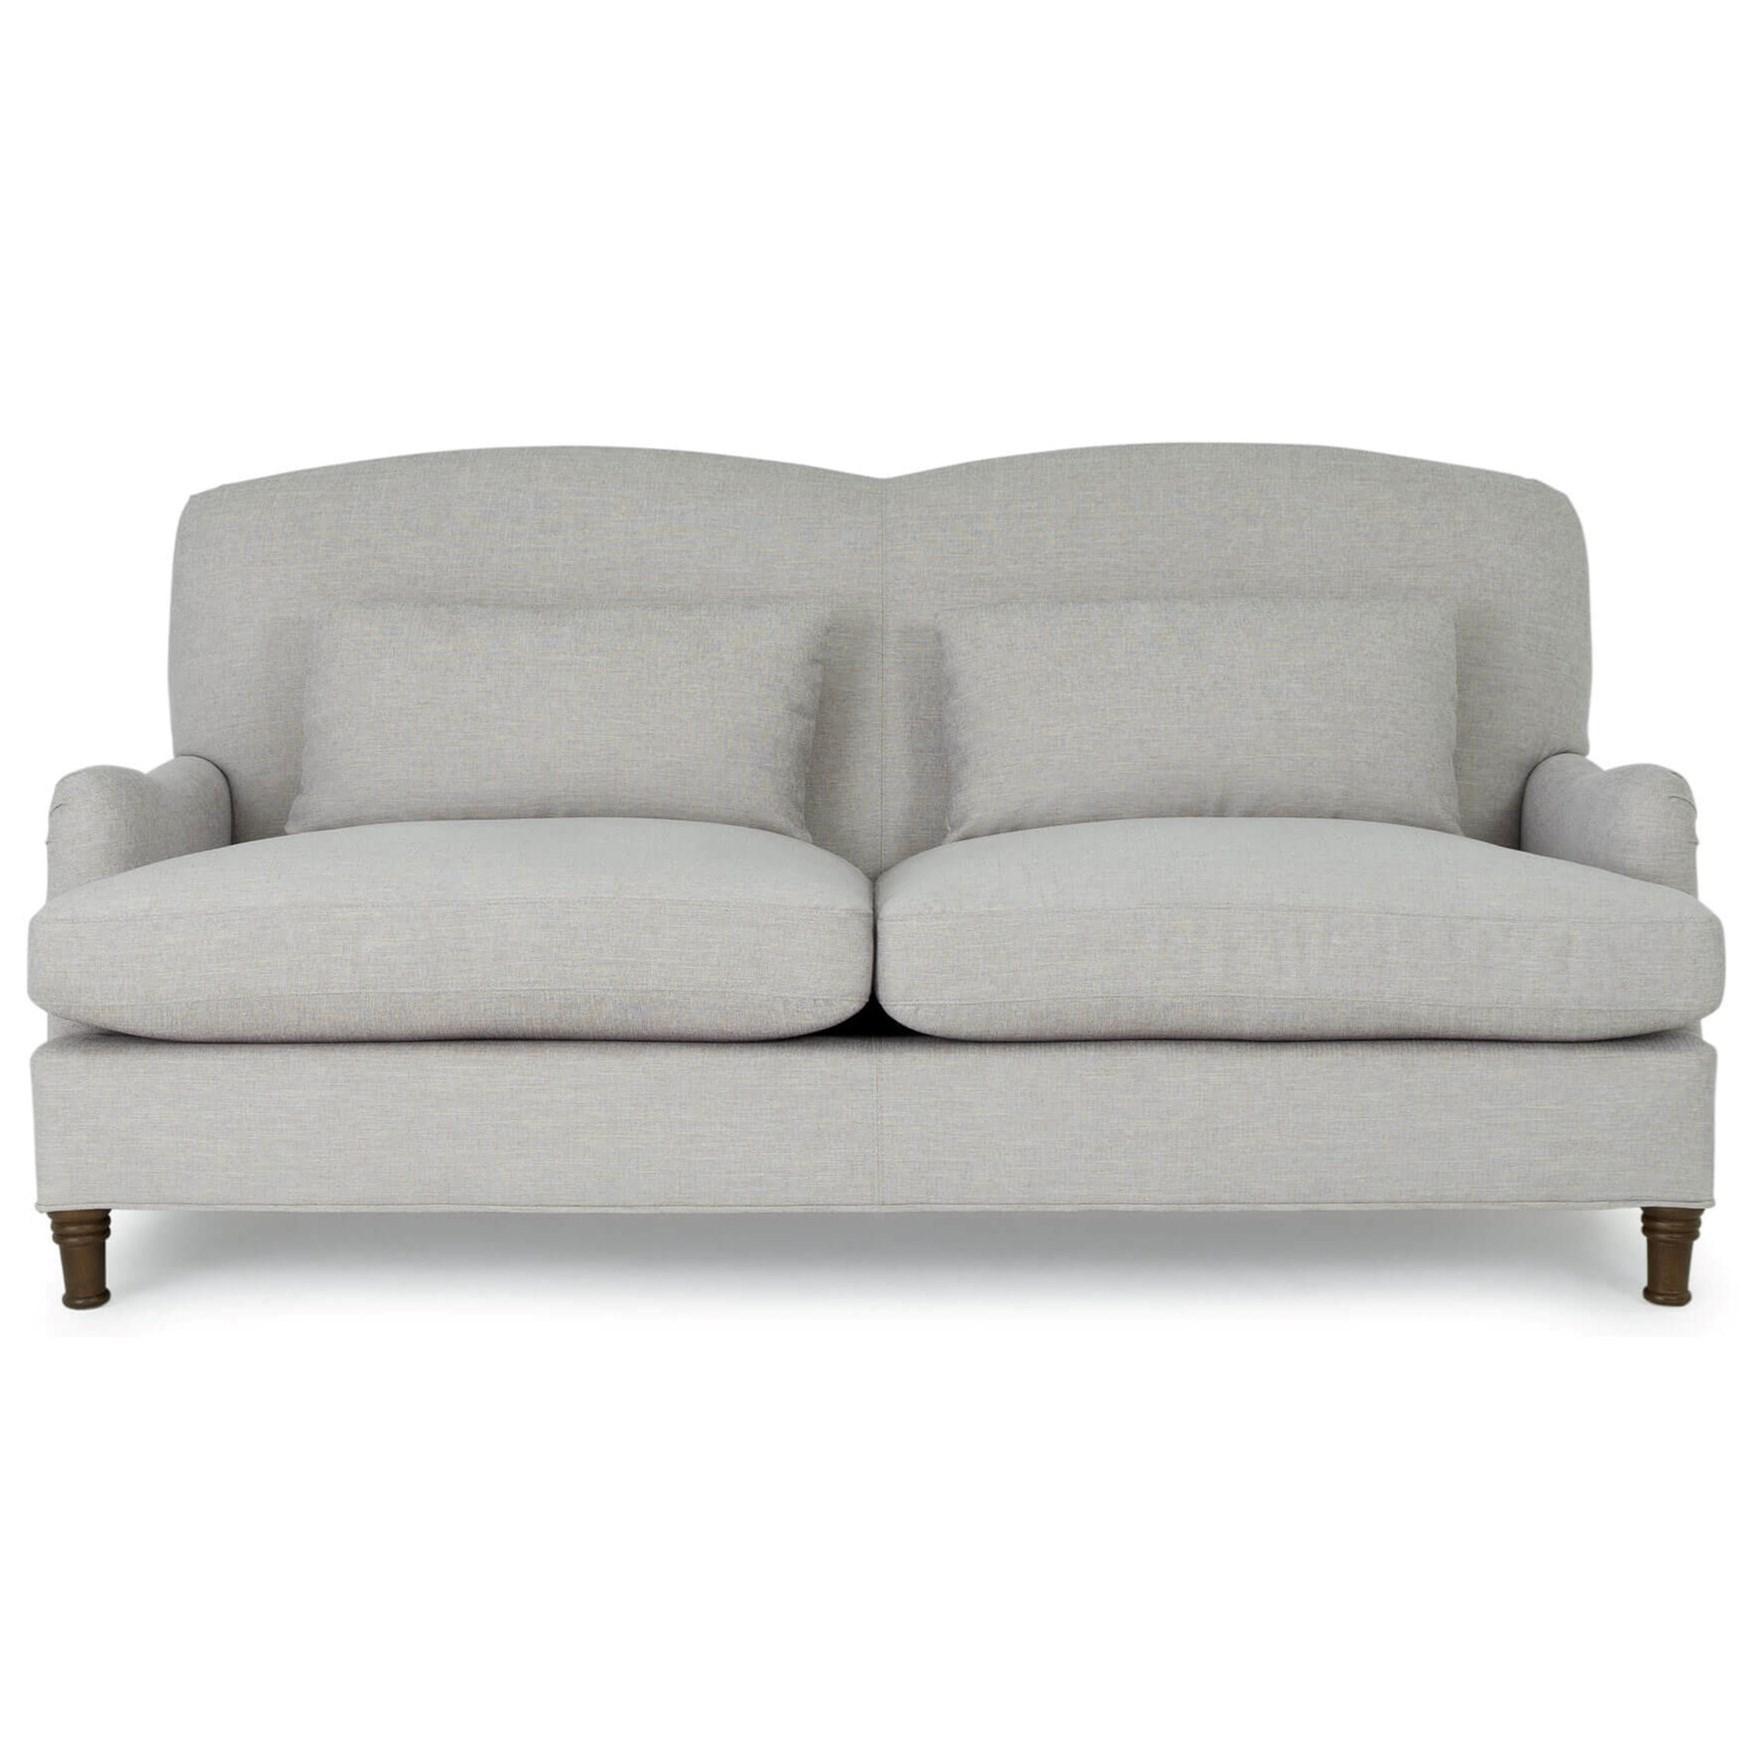 Vantage Apartment Sofa by Palliser at Stoney Creek Furniture